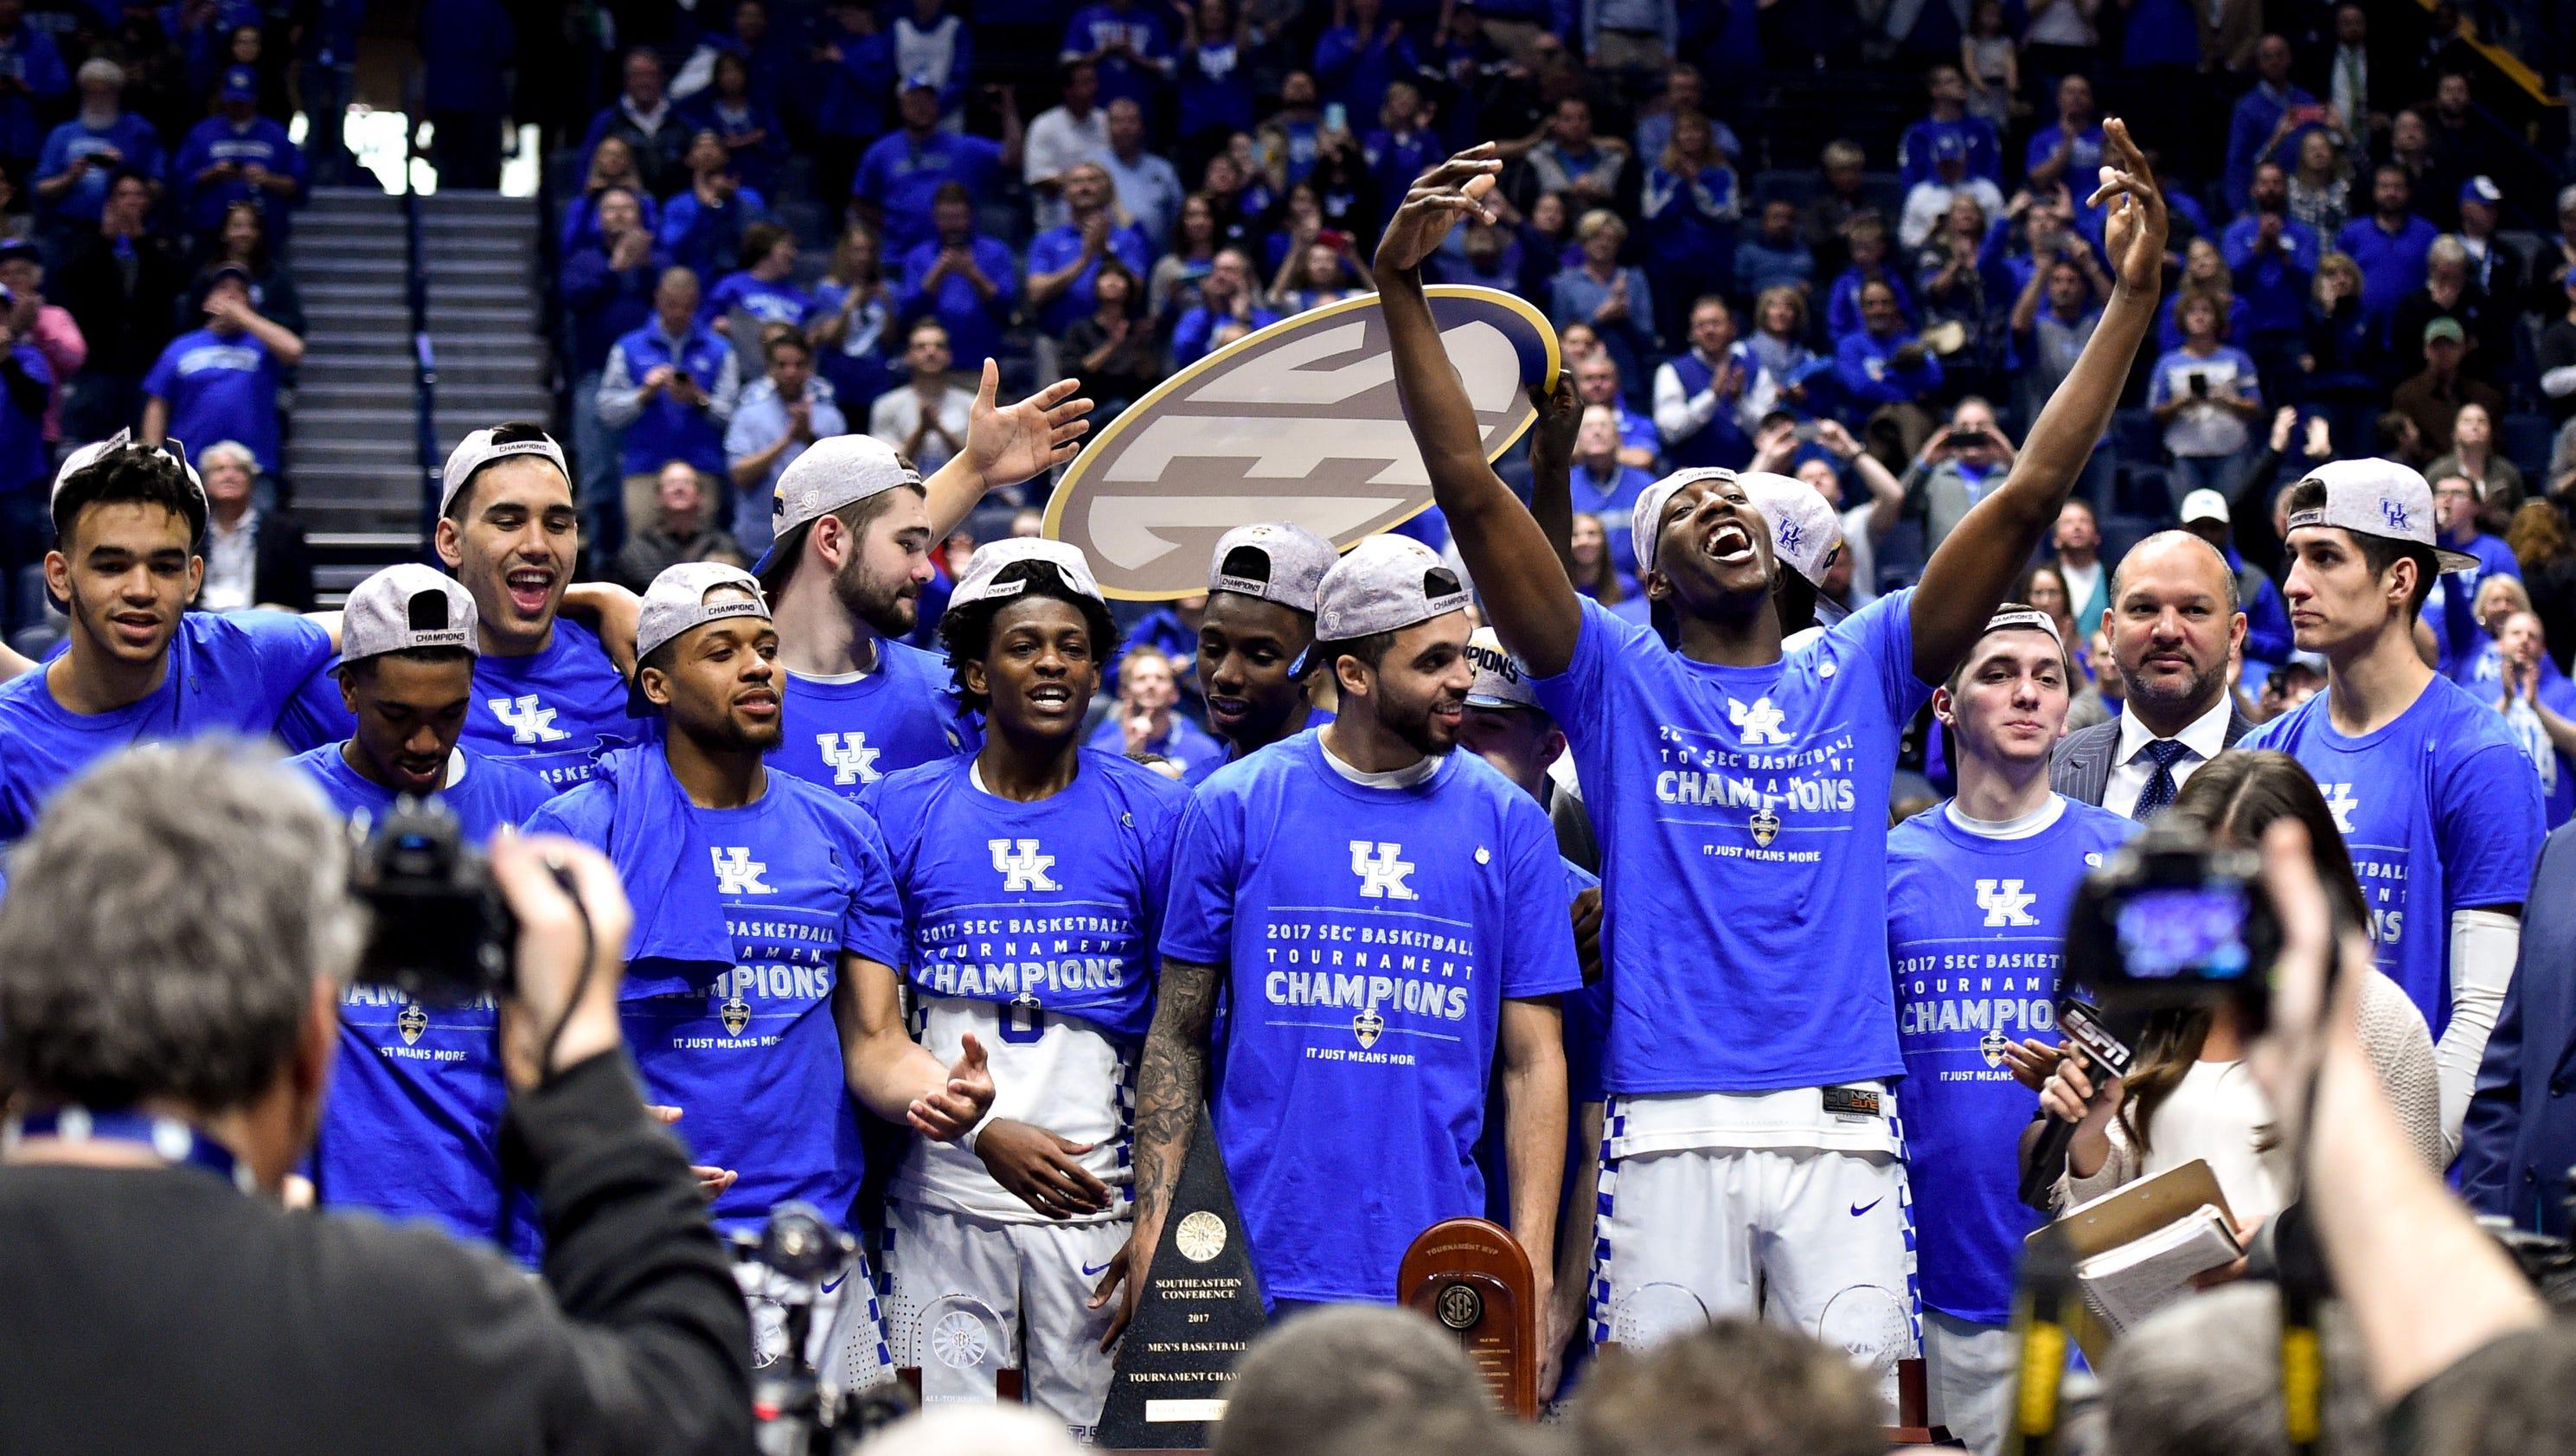 2017 SEC Men's Basketball Tournament schedule in Nashville